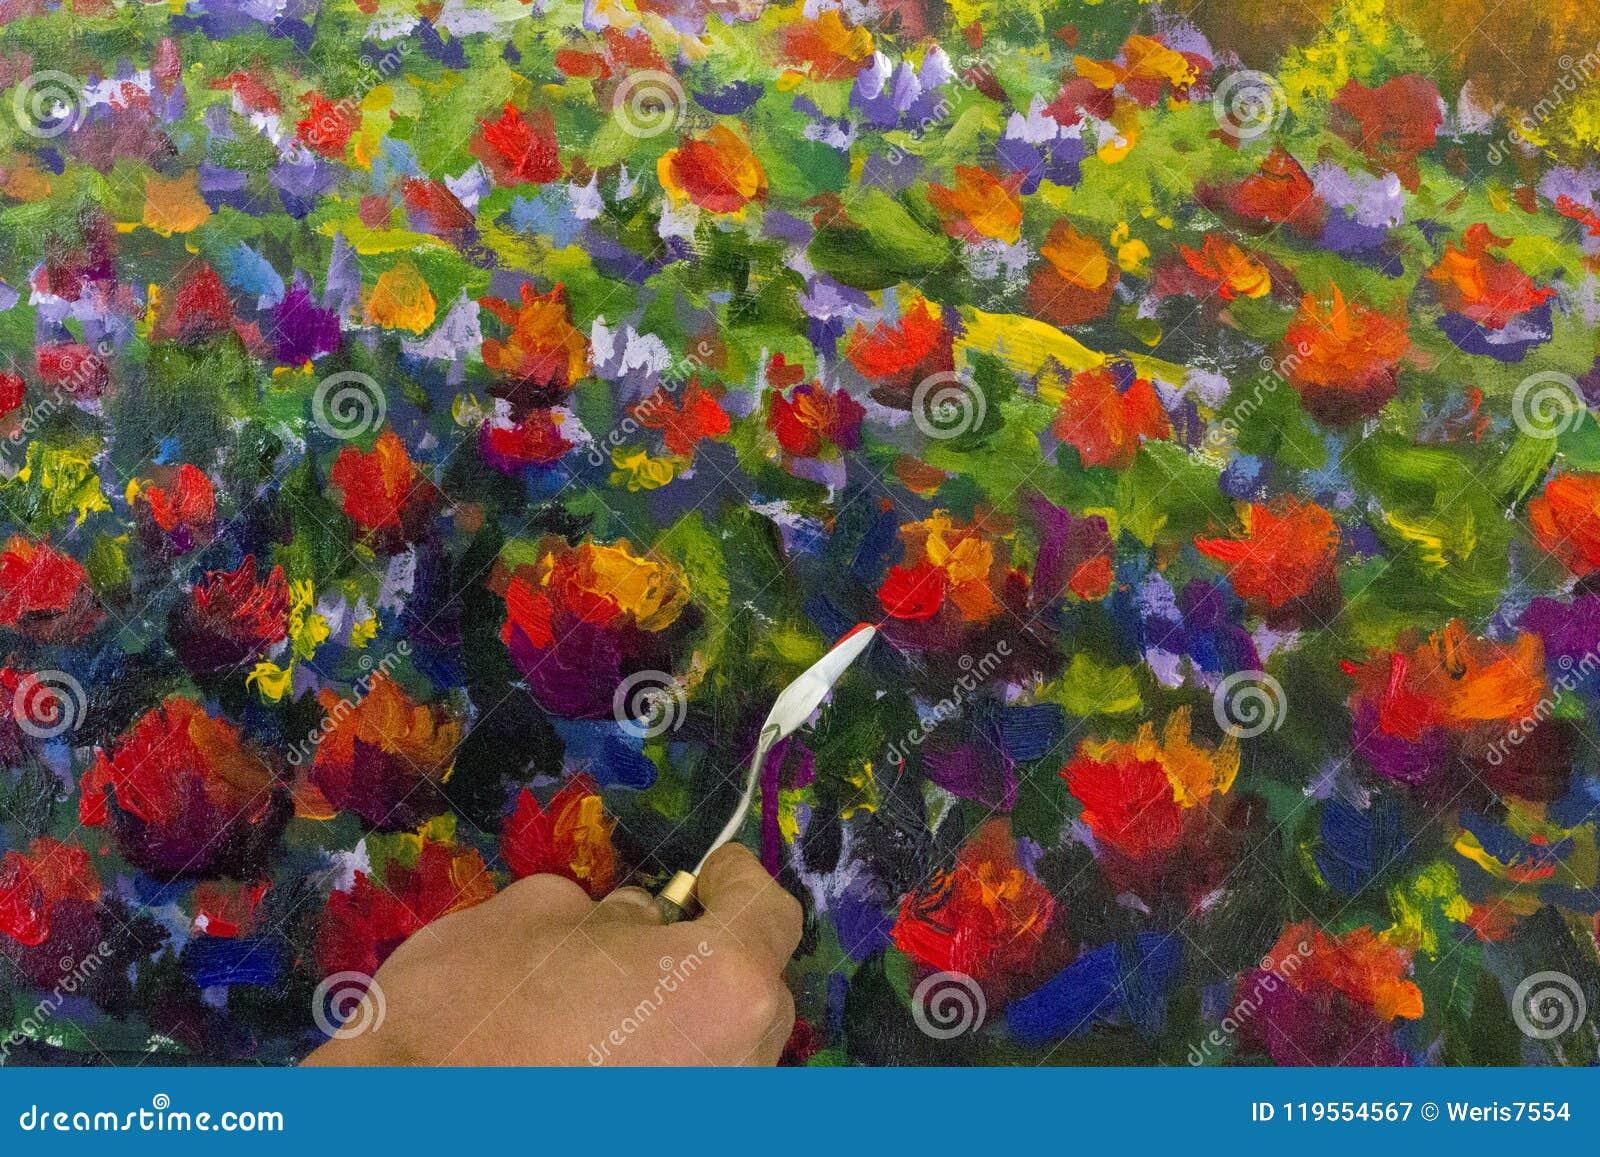 art creative process artist create heart painting on canvas stock